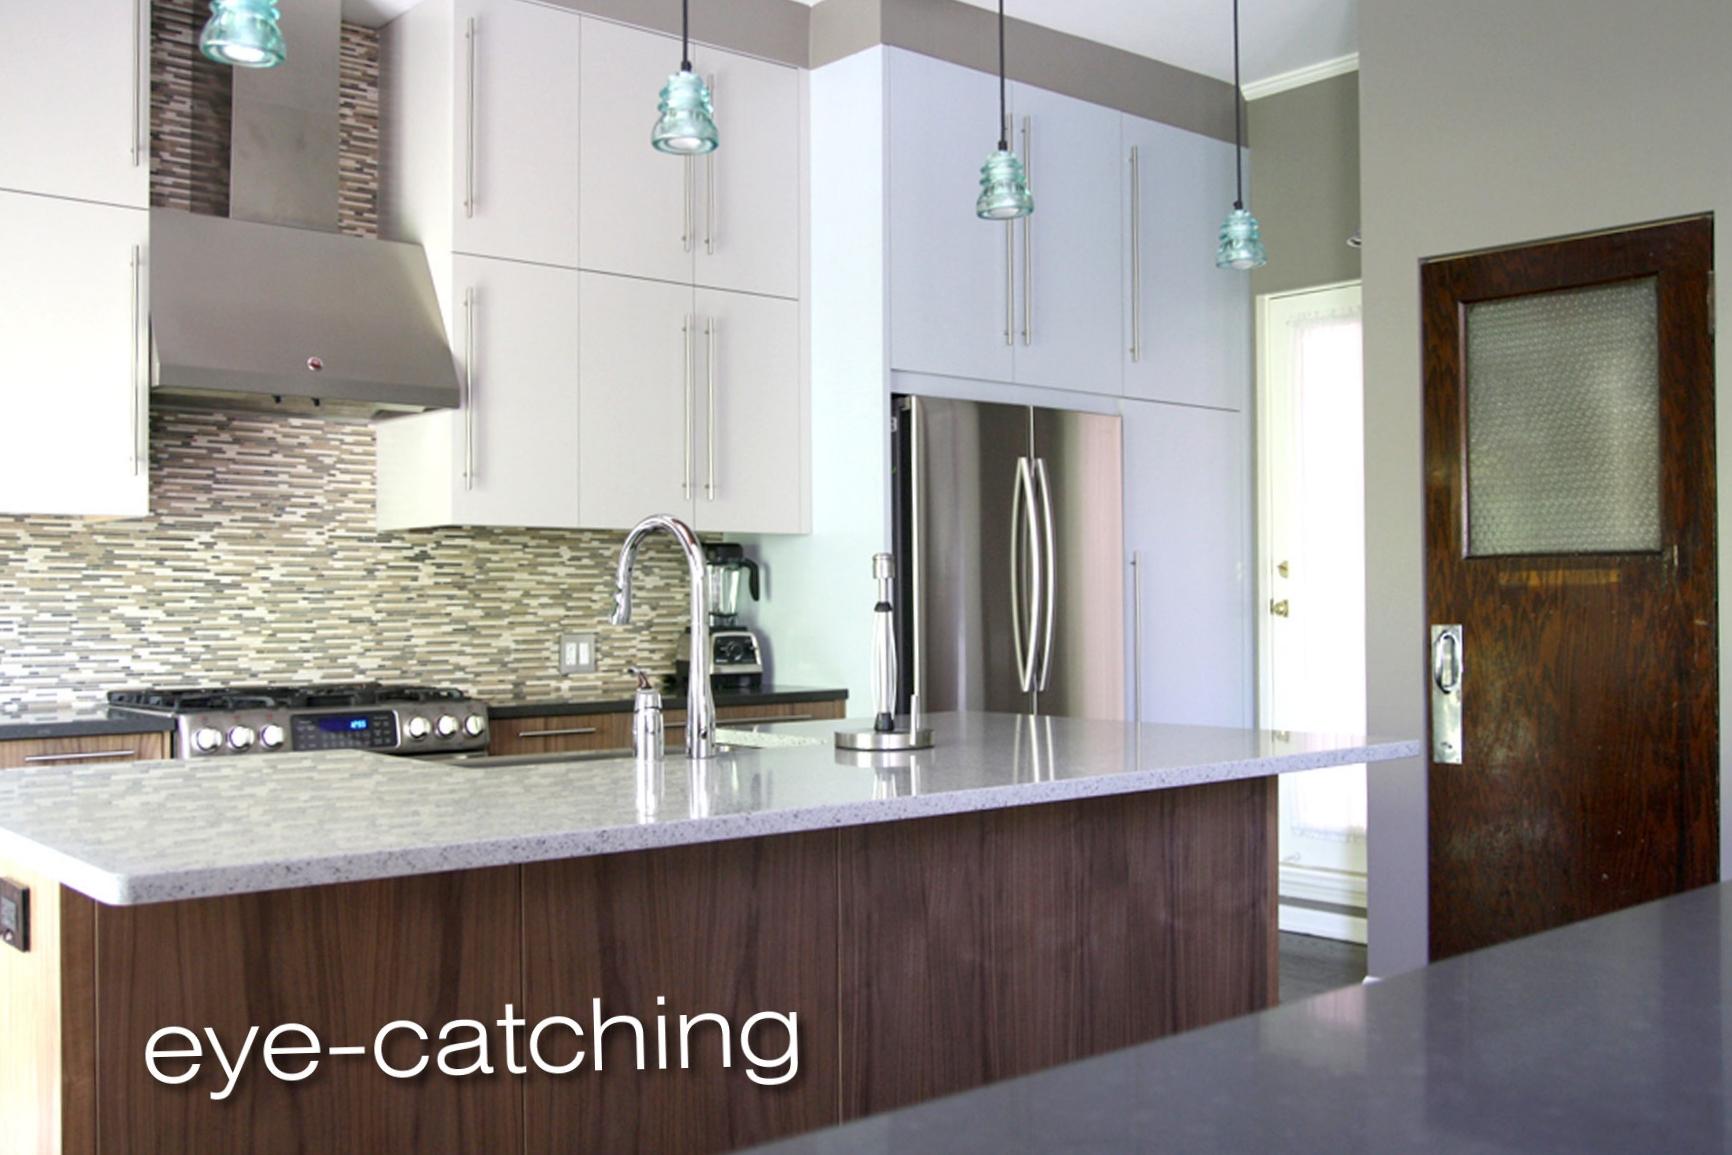 Kitchen-Eye-catching.jpg